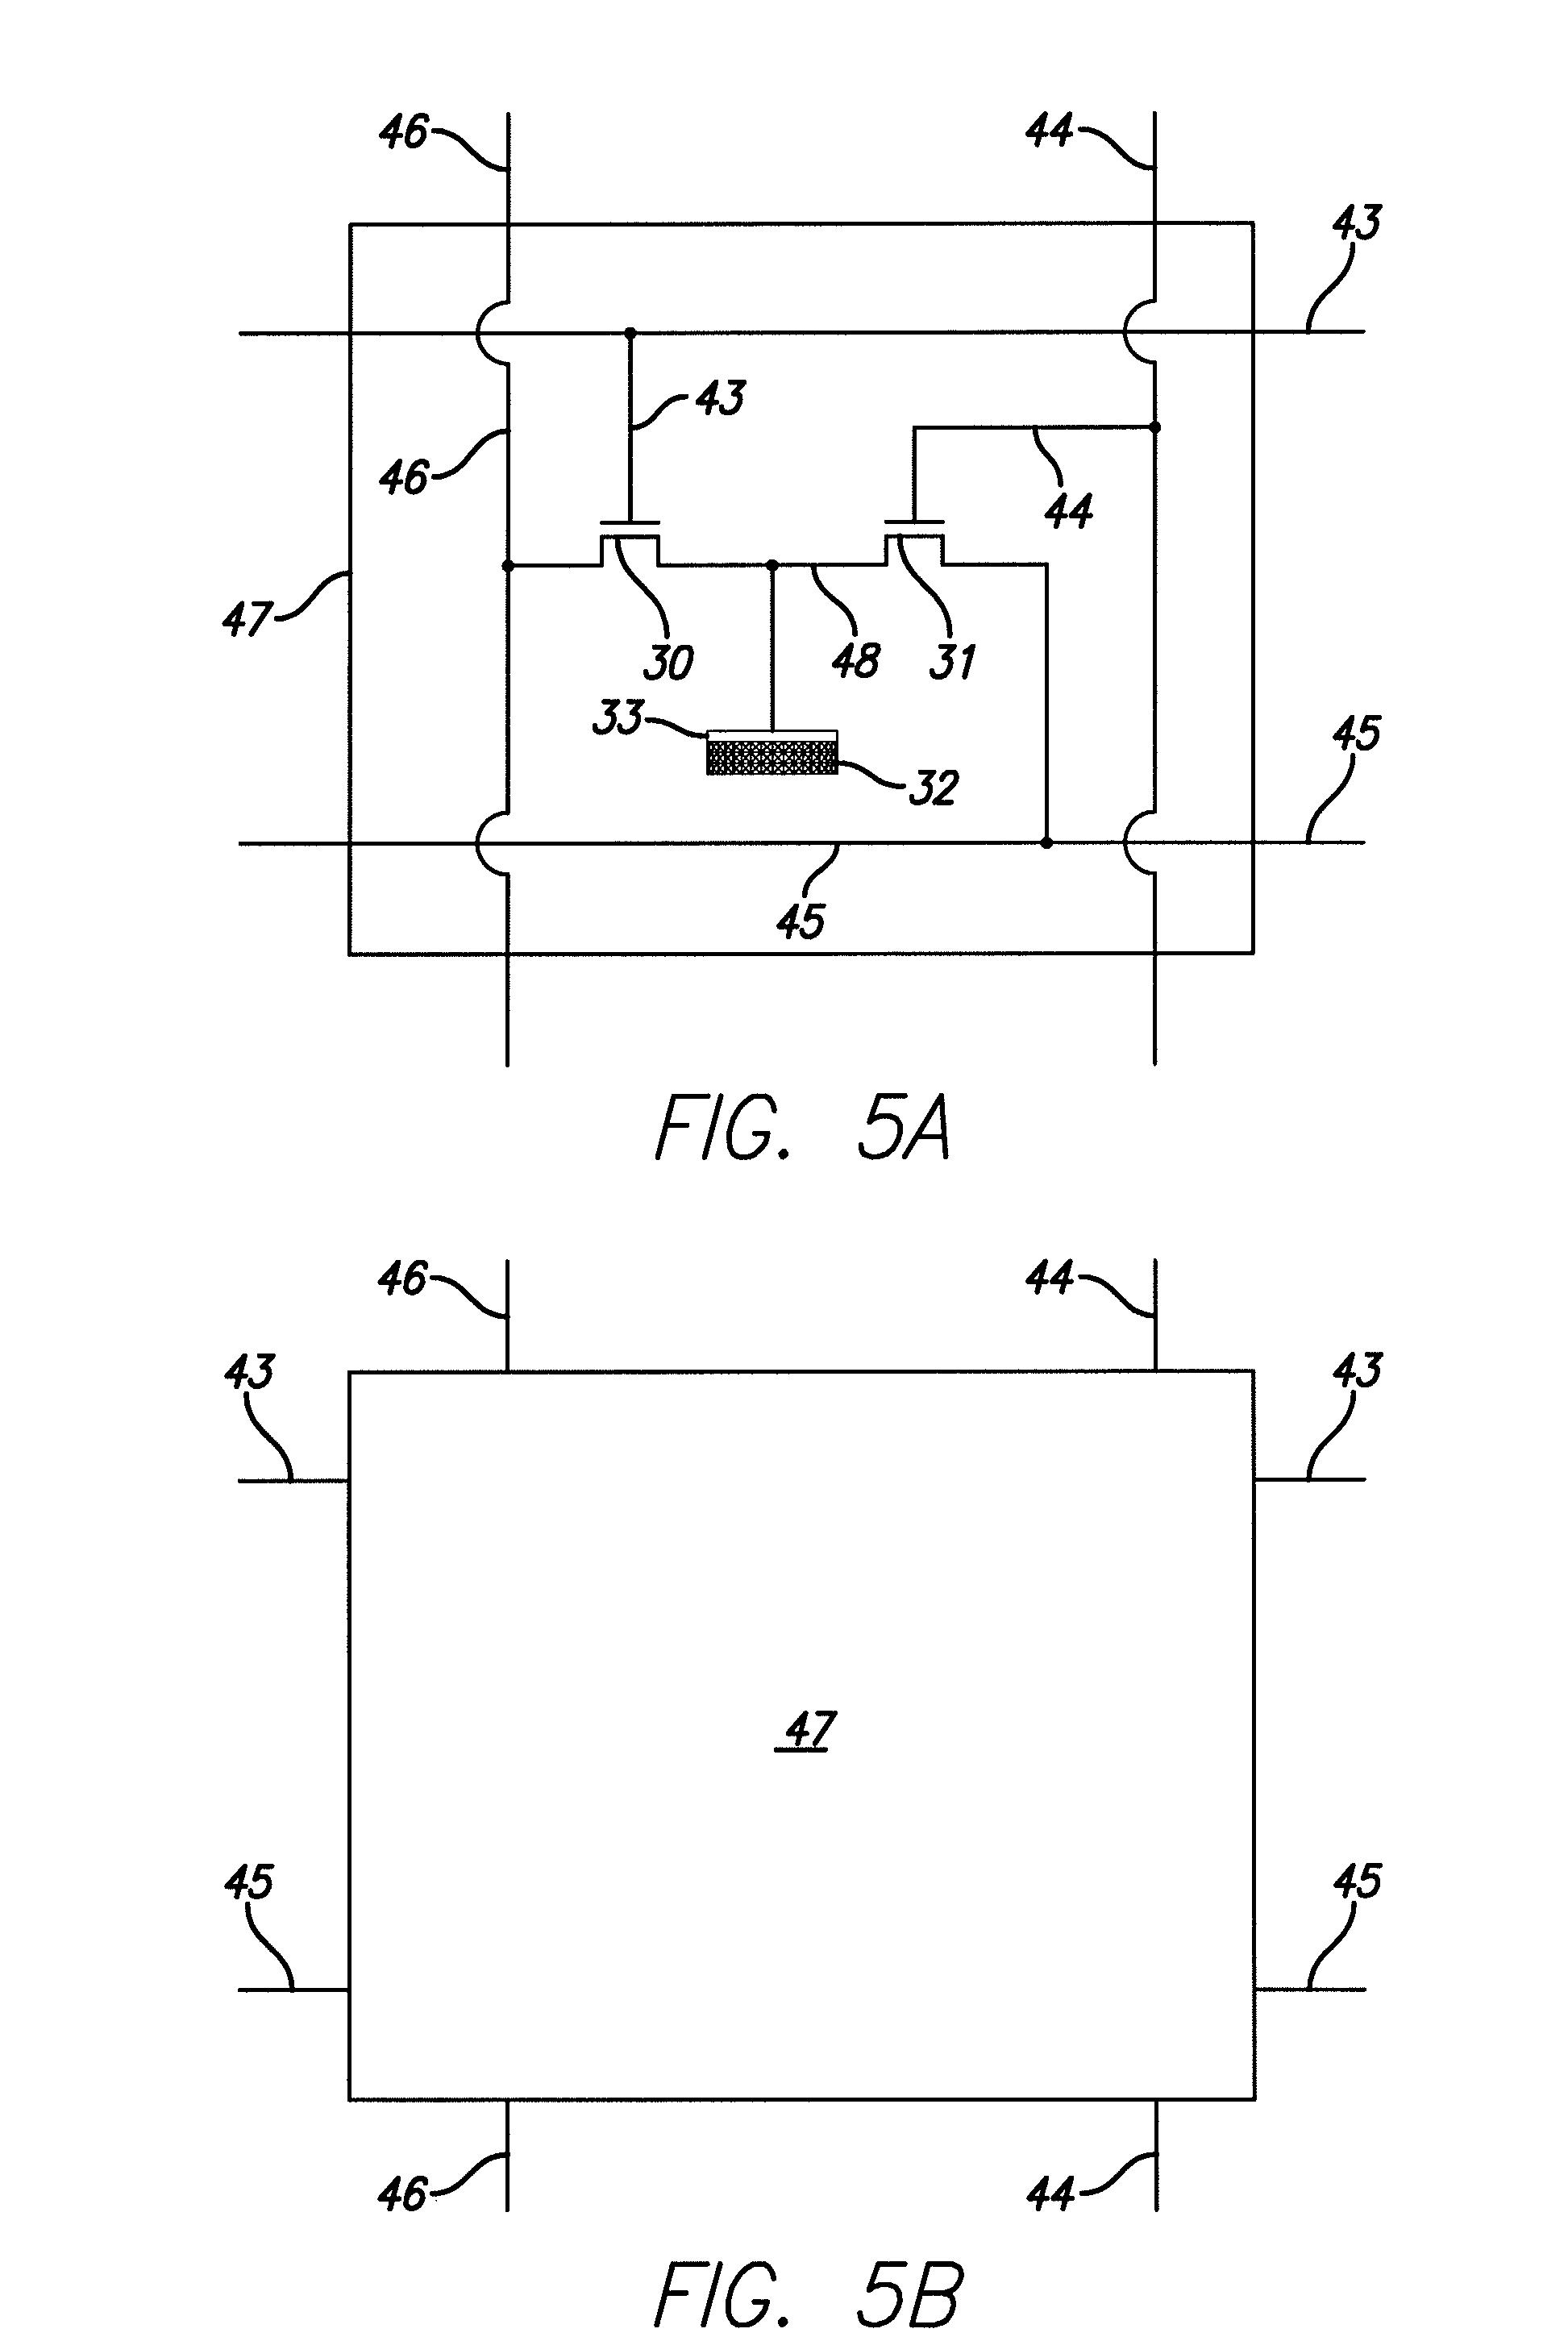 radar tracking aircraft vector clip wiring circuit diagram wiringradar tracking aircraft vector clip wiring circuit diagram bestpatent patent us 9,804,701 b2 patent radar tracking